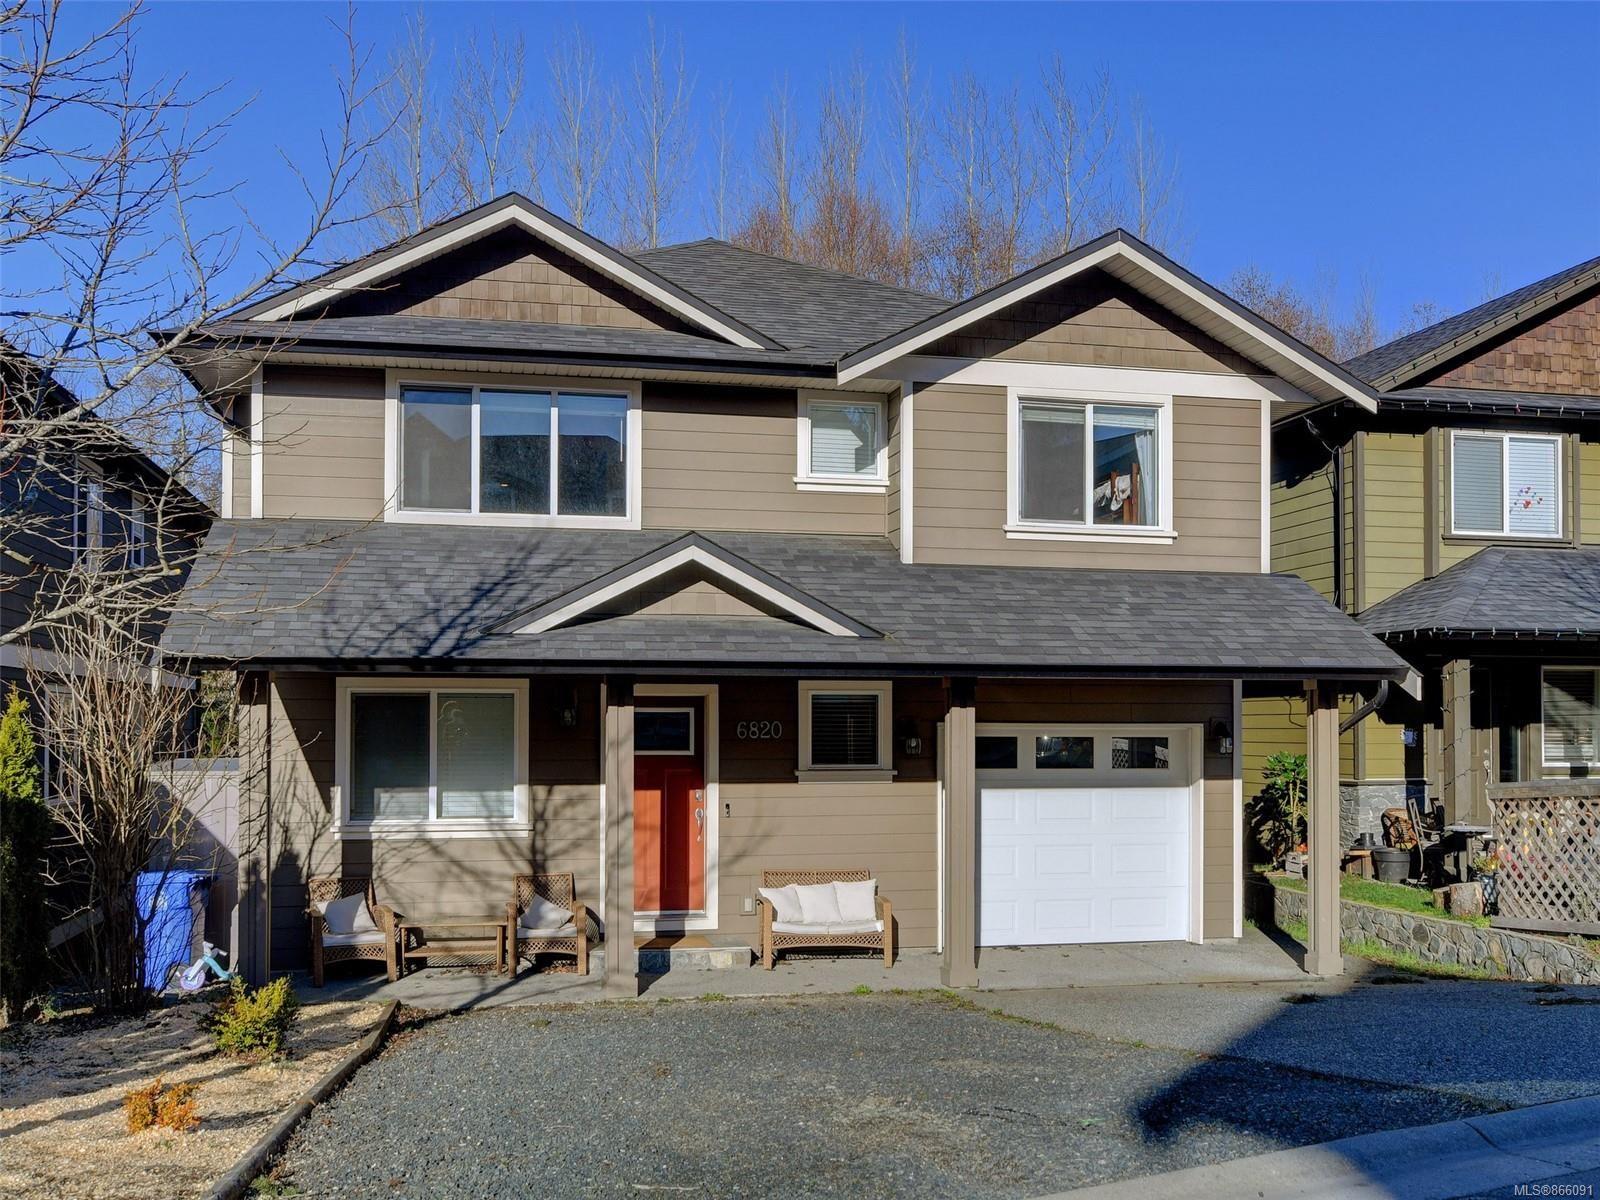 Main Photo: 6820 Marsden Rd in : Sk Broomhill House for sale (Sooke)  : MLS®# 866091